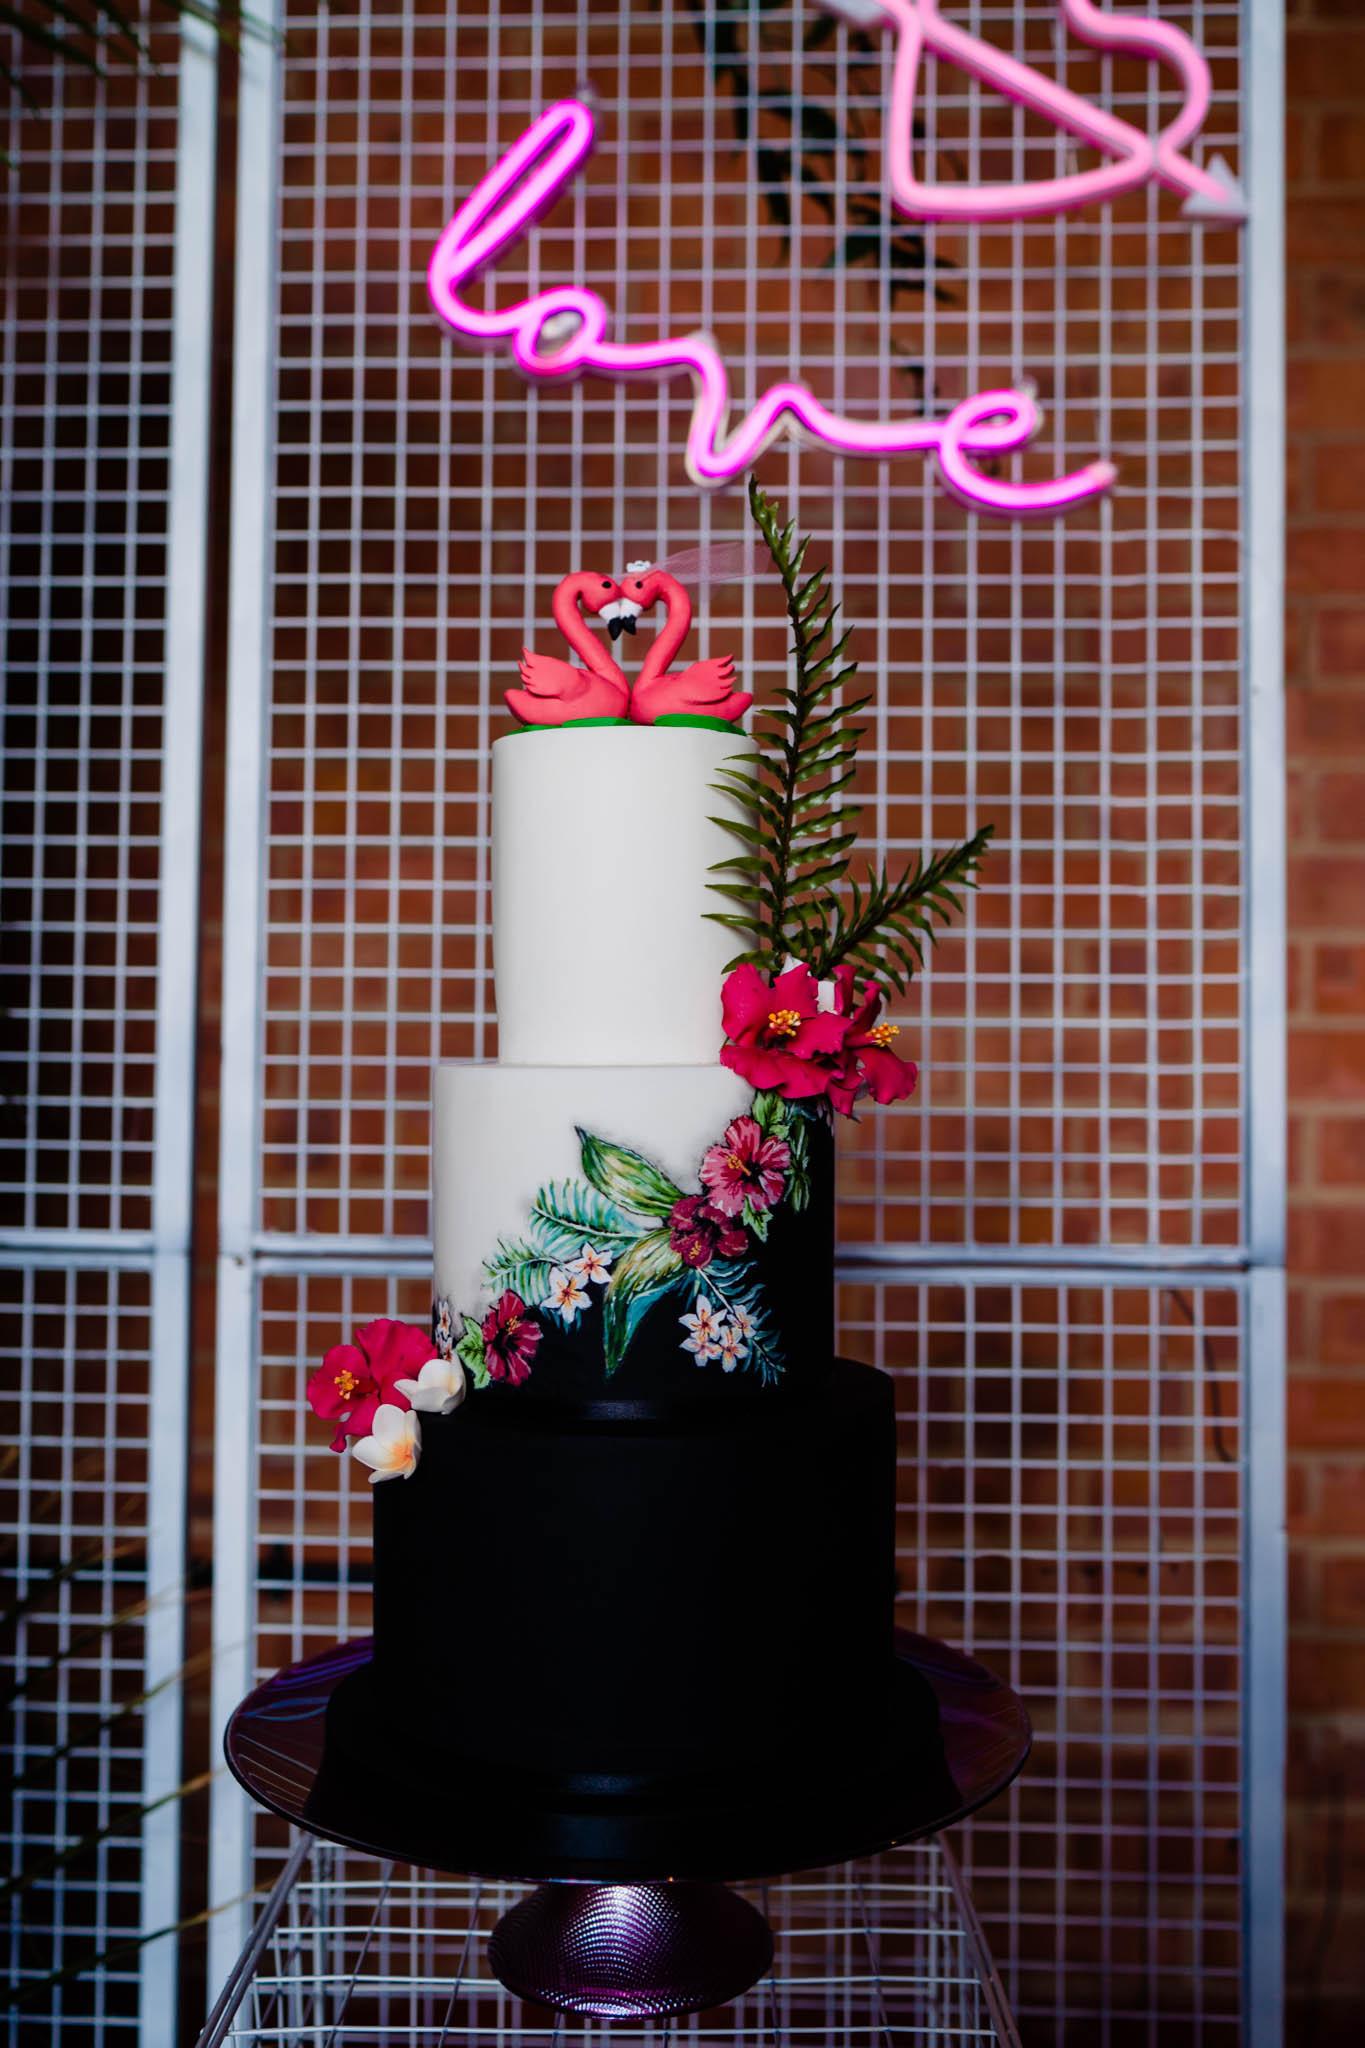 flamingo wedding cake - modern wedding cake - tropical wedding cake - modern tropical wedding - modern wedding - modern bride - east midlands wedding planner